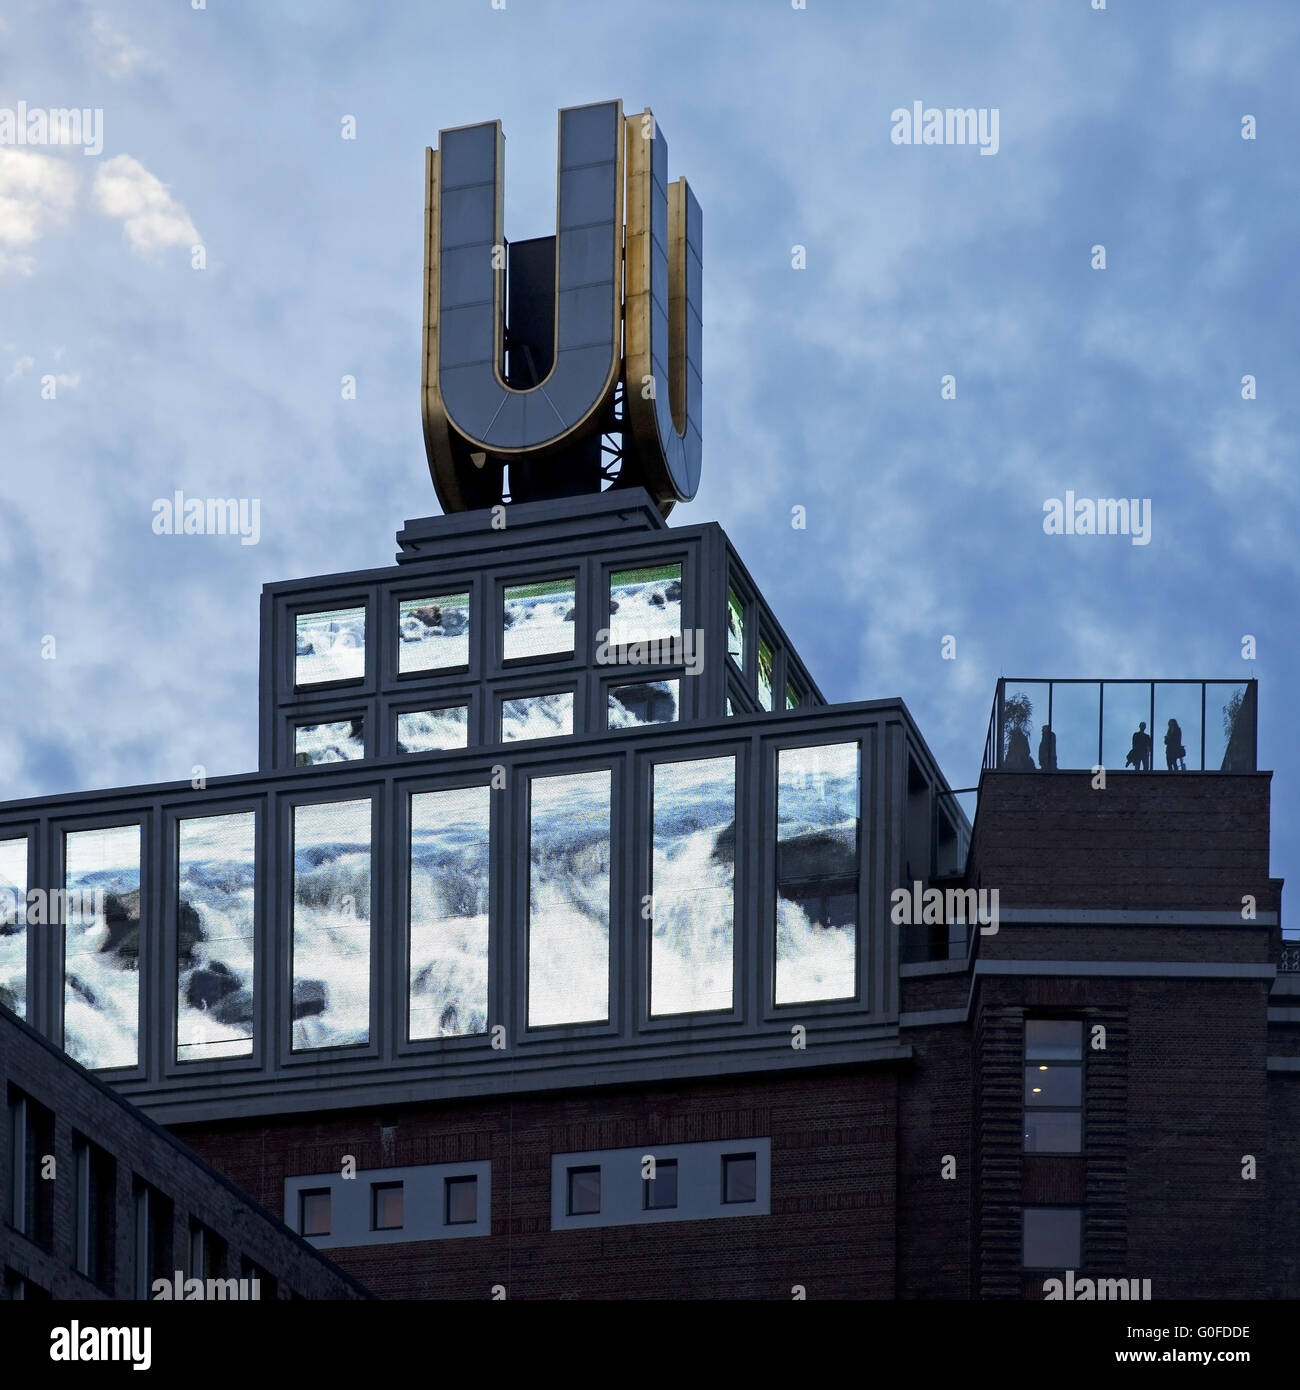 Dortmund U-Tower or Dortmund U with people on the roof terrace, Dortmund, Ruhr area, Germany - Stock Image